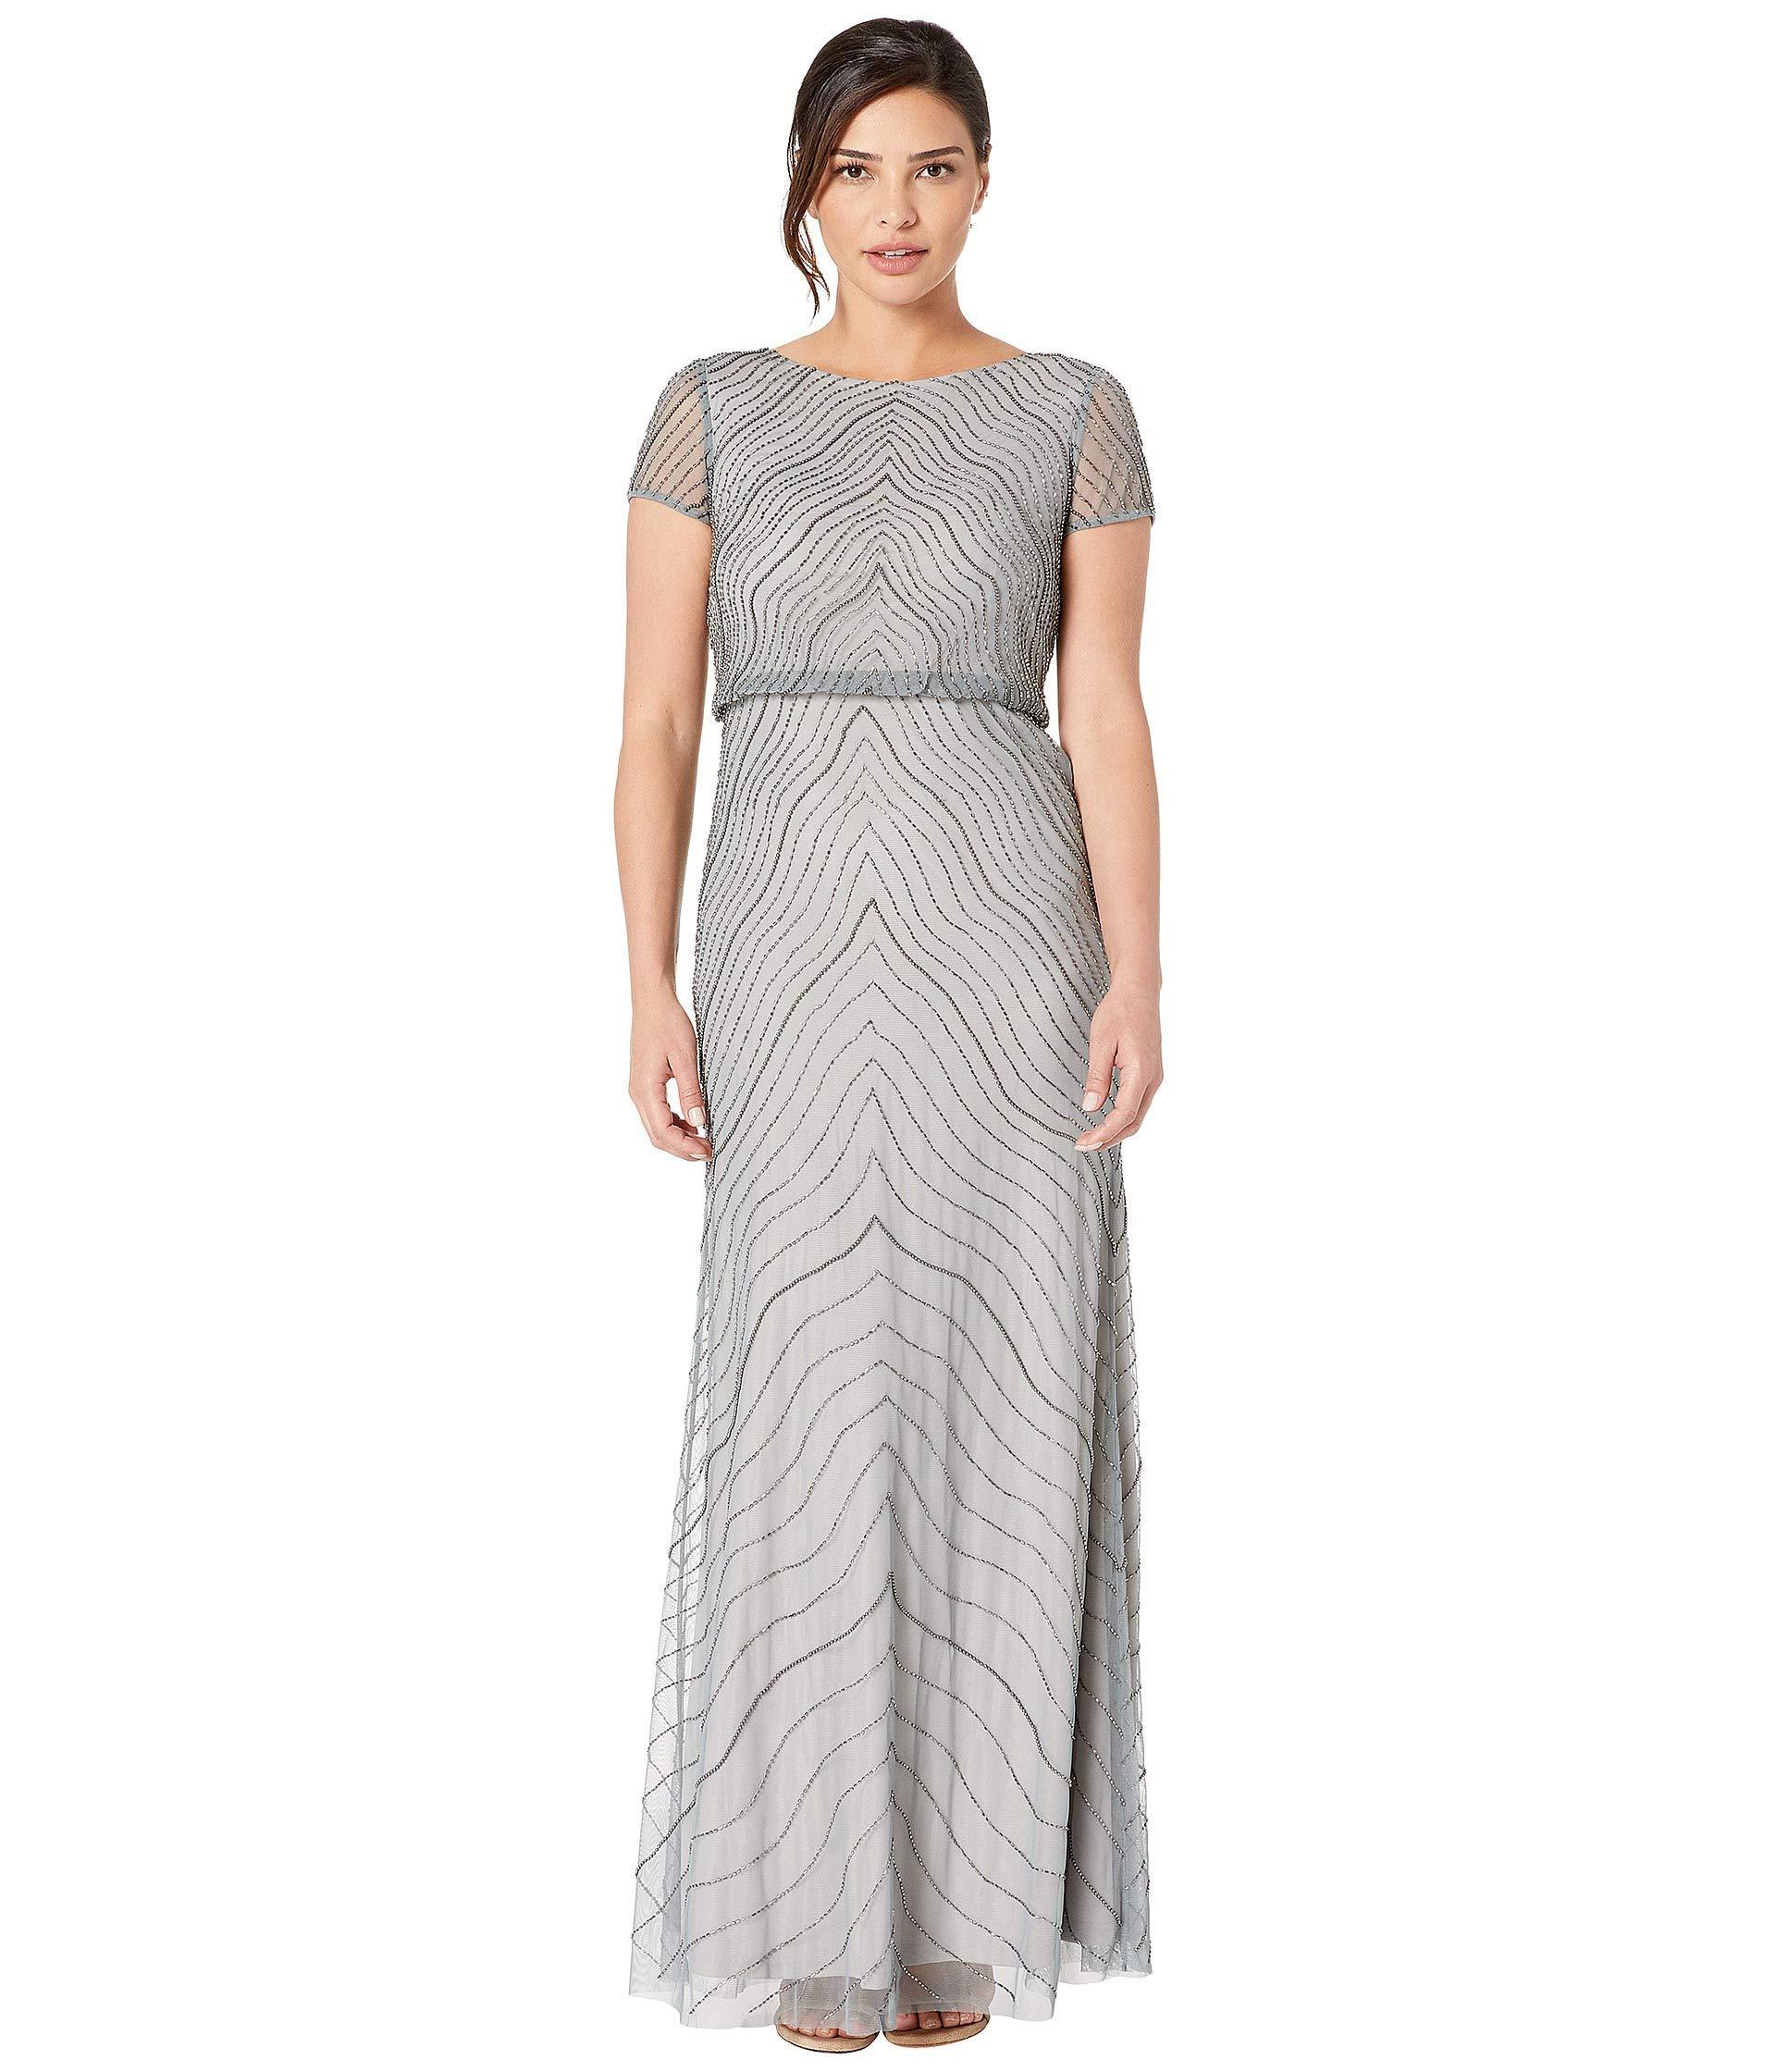 9730cd63e60f ... Beaded Blouson Evening Gown (slate) Women's Dress -. View fullscreen